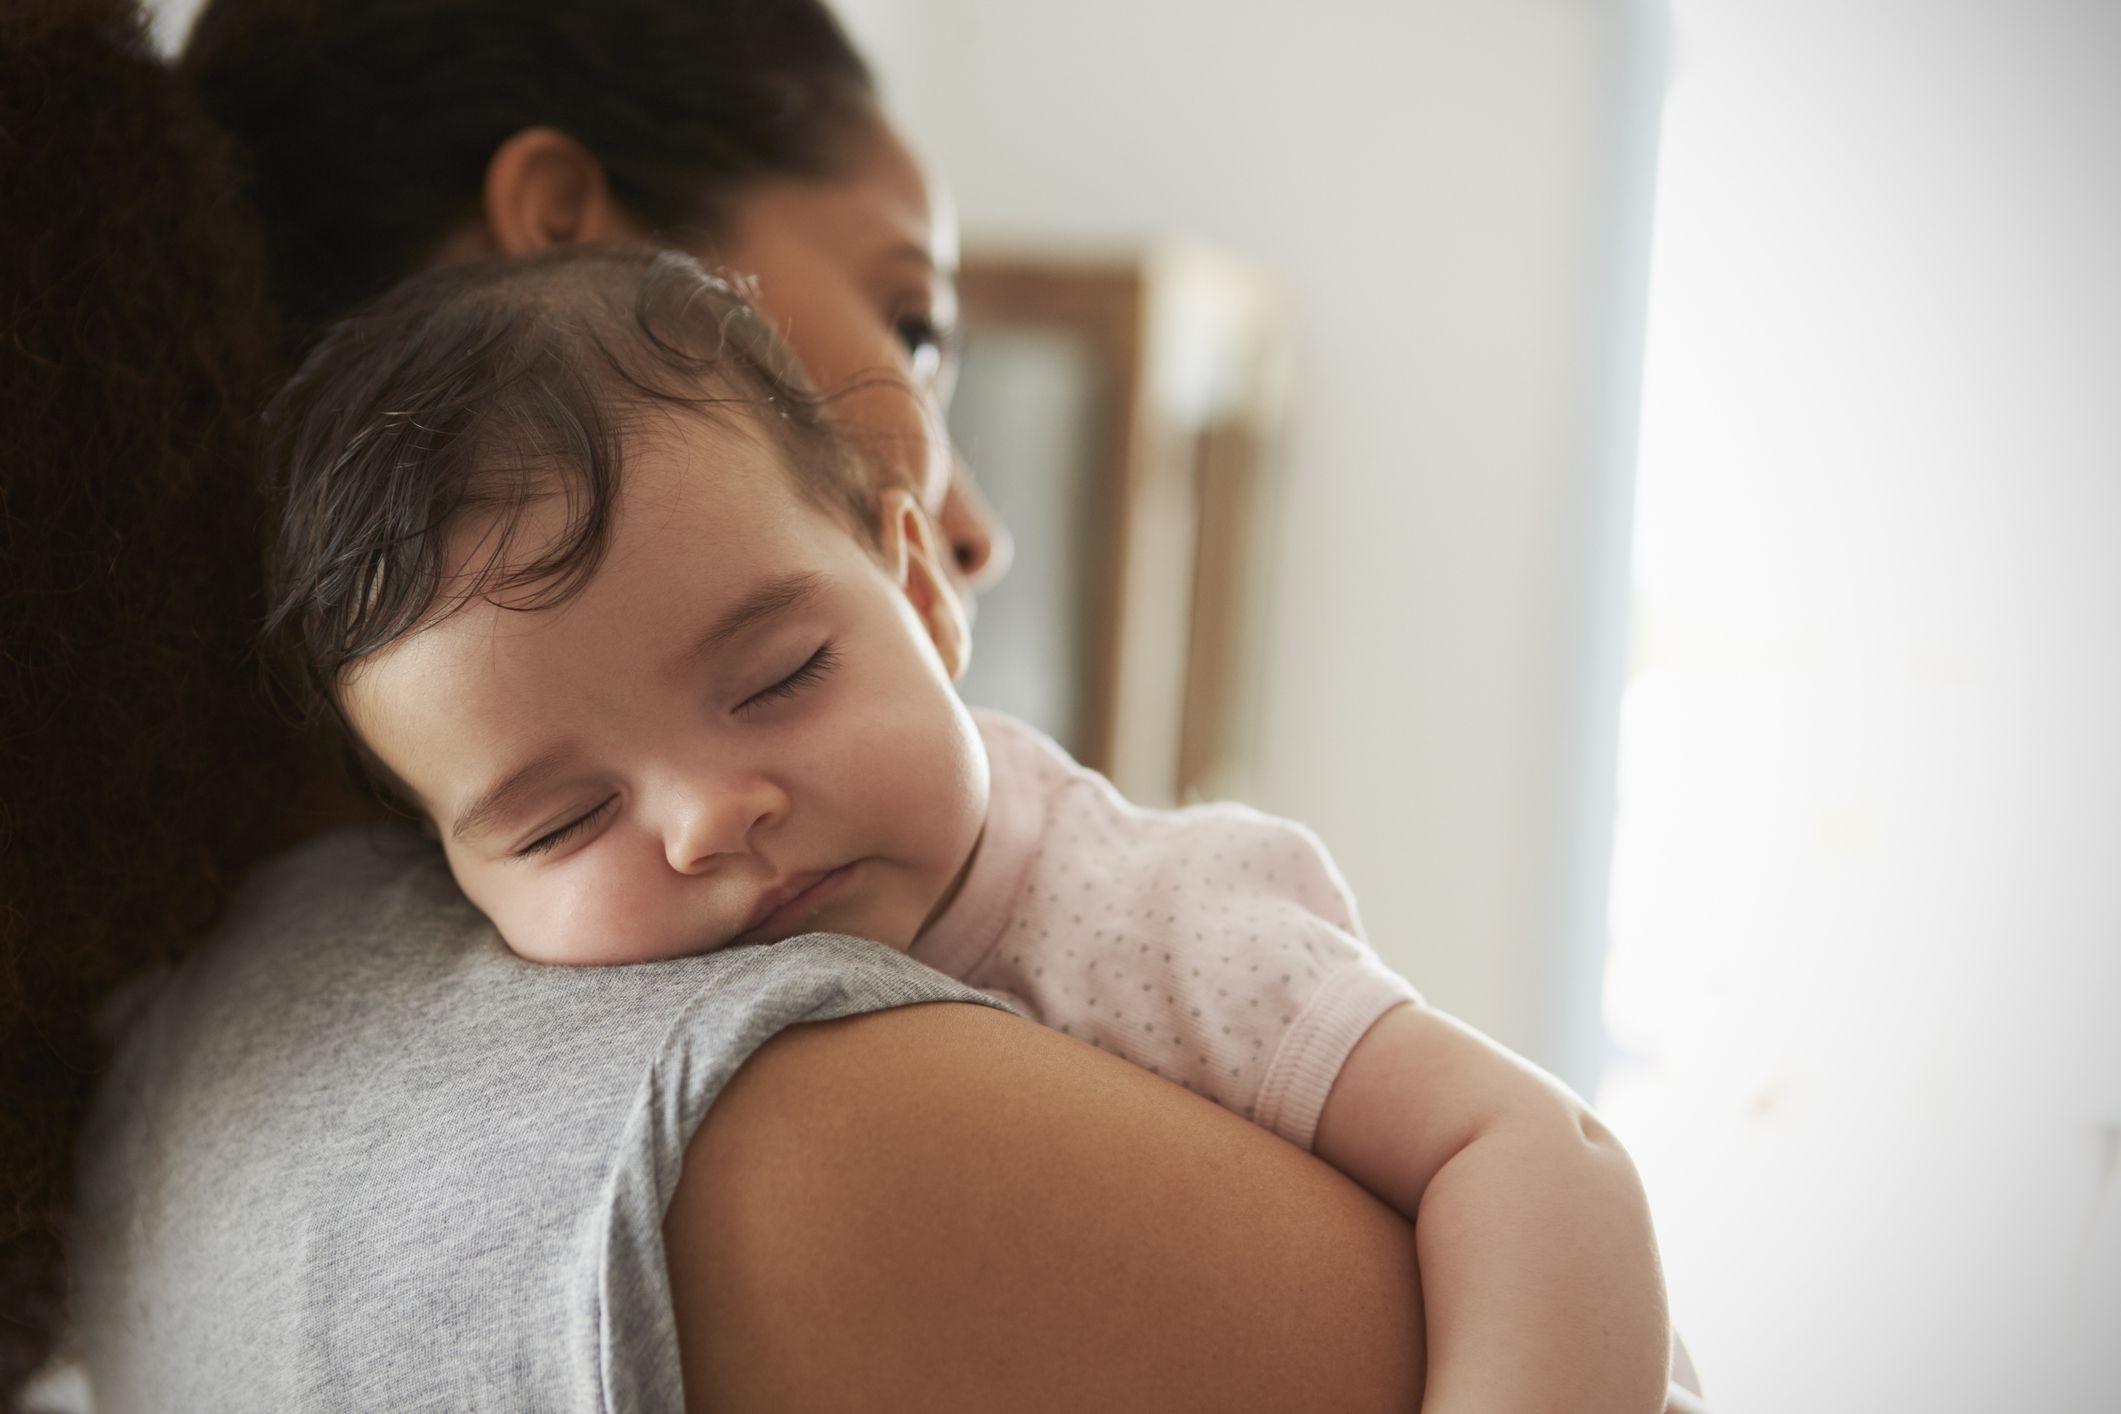 baby-mother-parent-sleep-stock